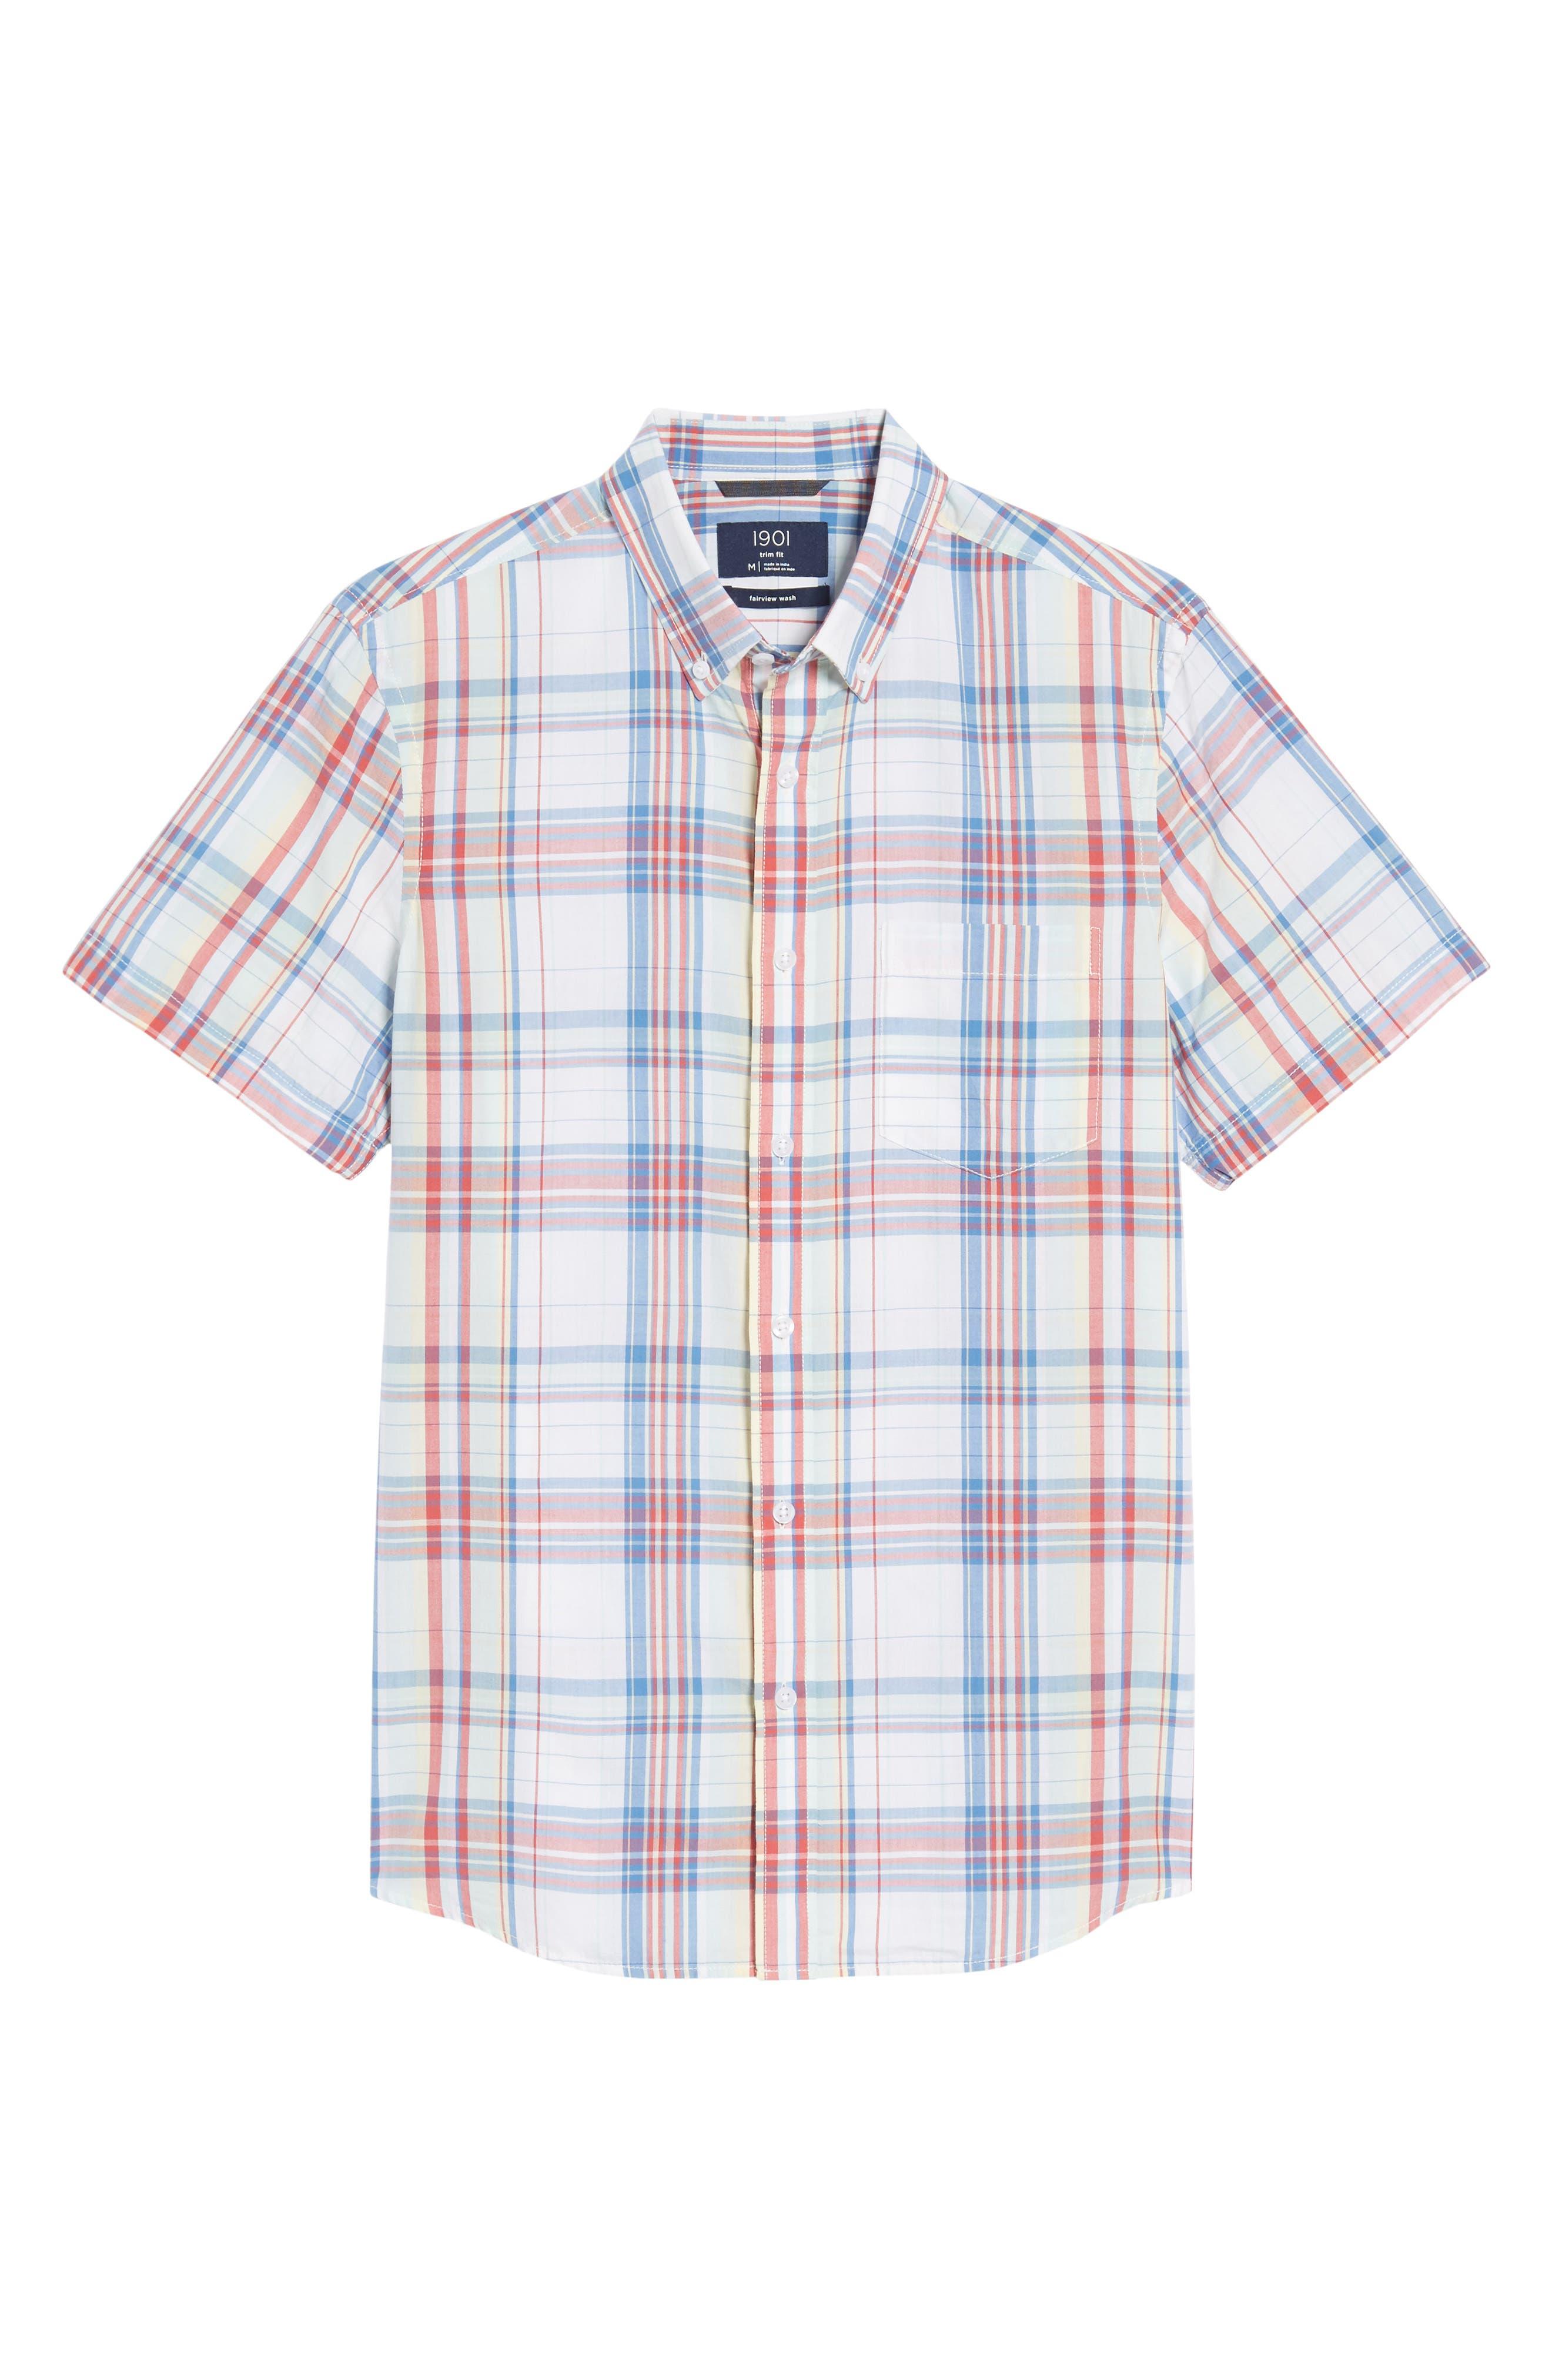 Trim Fit Plaid Short Sleeve Sport Shirt,                             Alternate thumbnail 6, color,                             White Red Multi Plaid